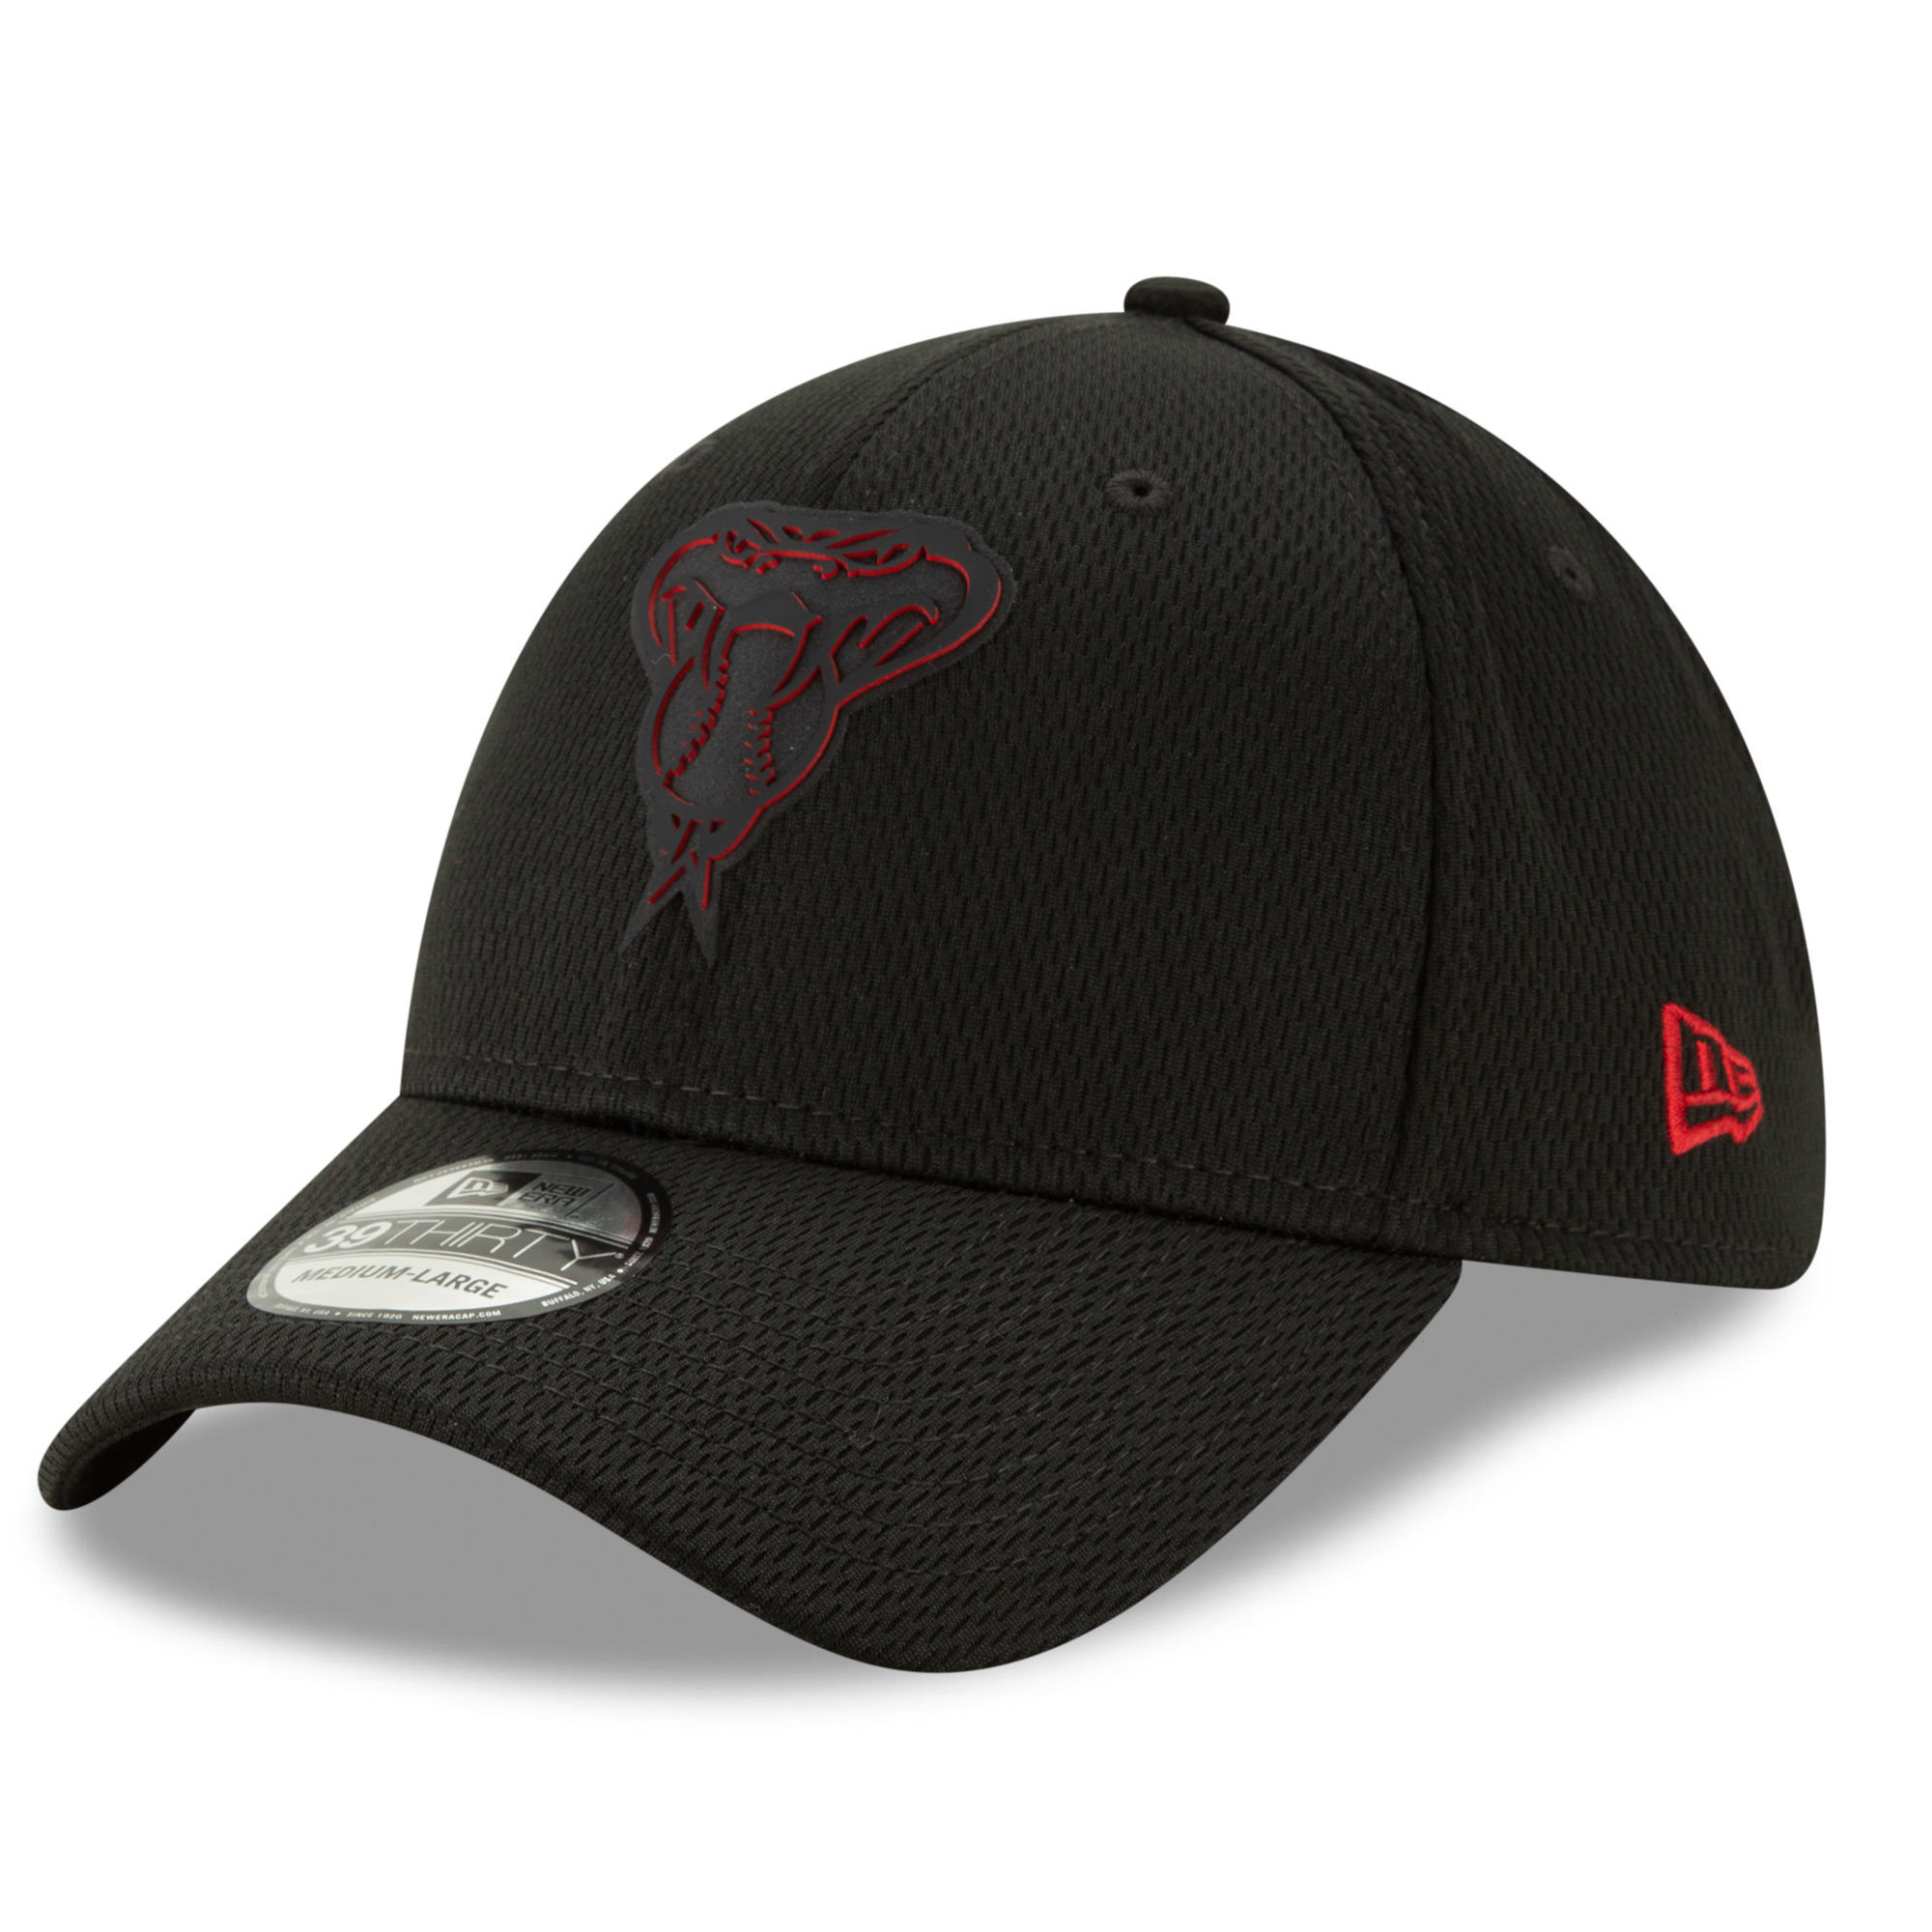 Arizona Diamondbacks New Era 2019 Clubhouse Collection 39THIRTY Flex Hat - Black